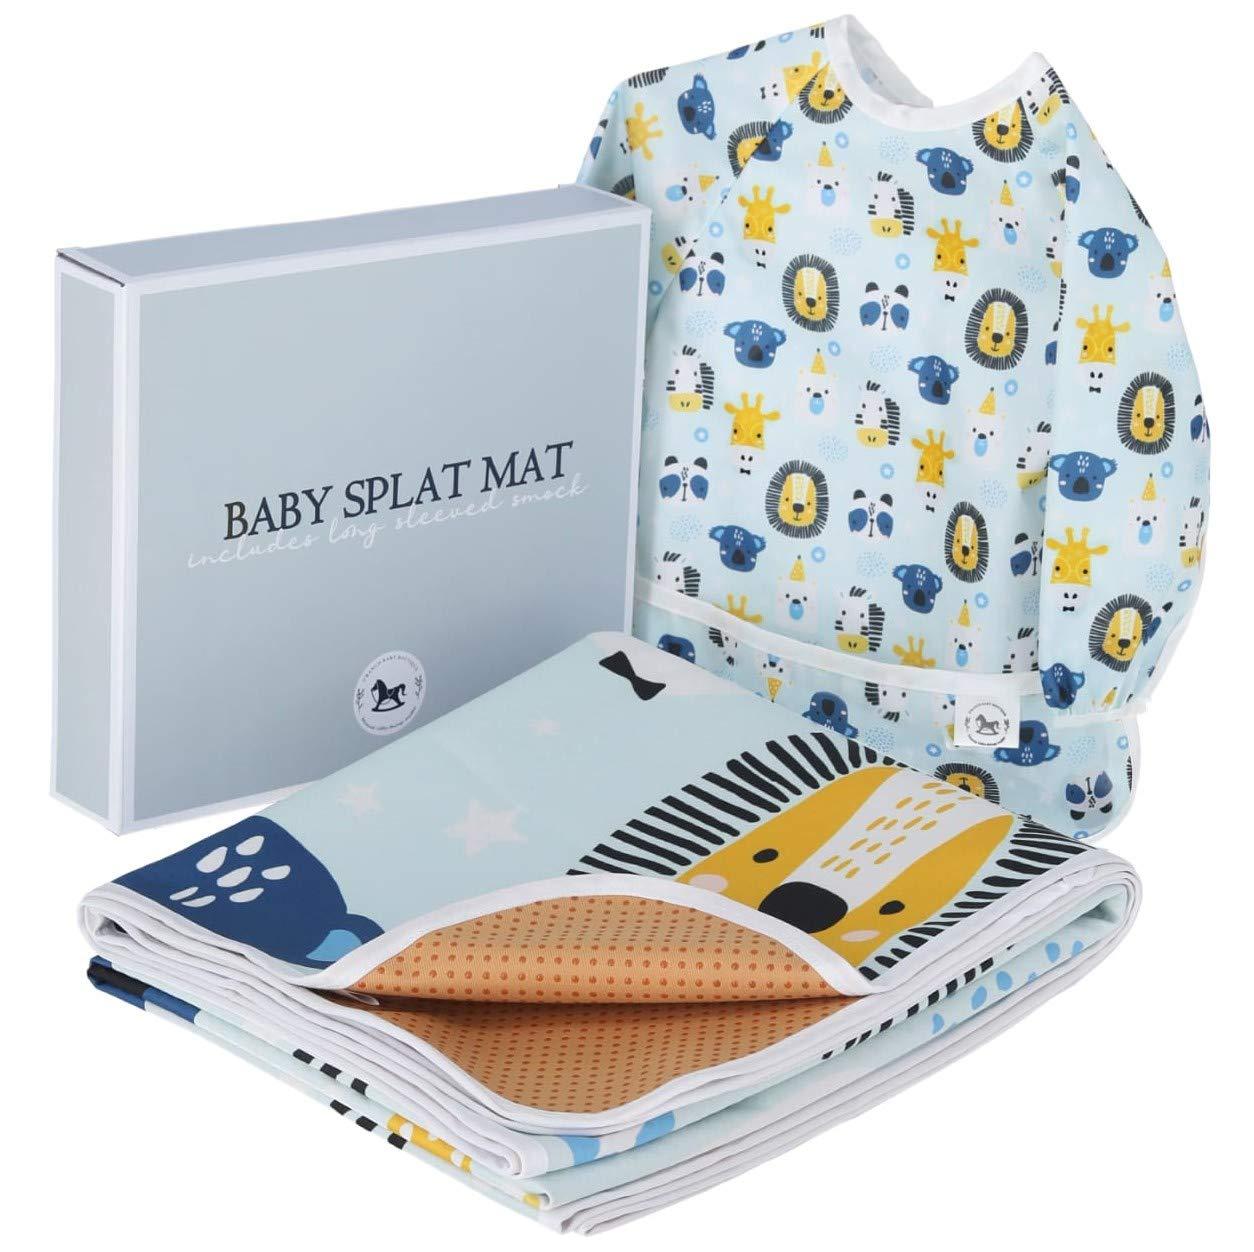 Baby Splat Mat for Under High Chair Floor Mat - Baby Feeding Set, Splash Mat, Waterproof Floor Mat - Anti Slip, Washable, Extra Large (51 Inch) + Baby Bib with Sleeves - Animal Design